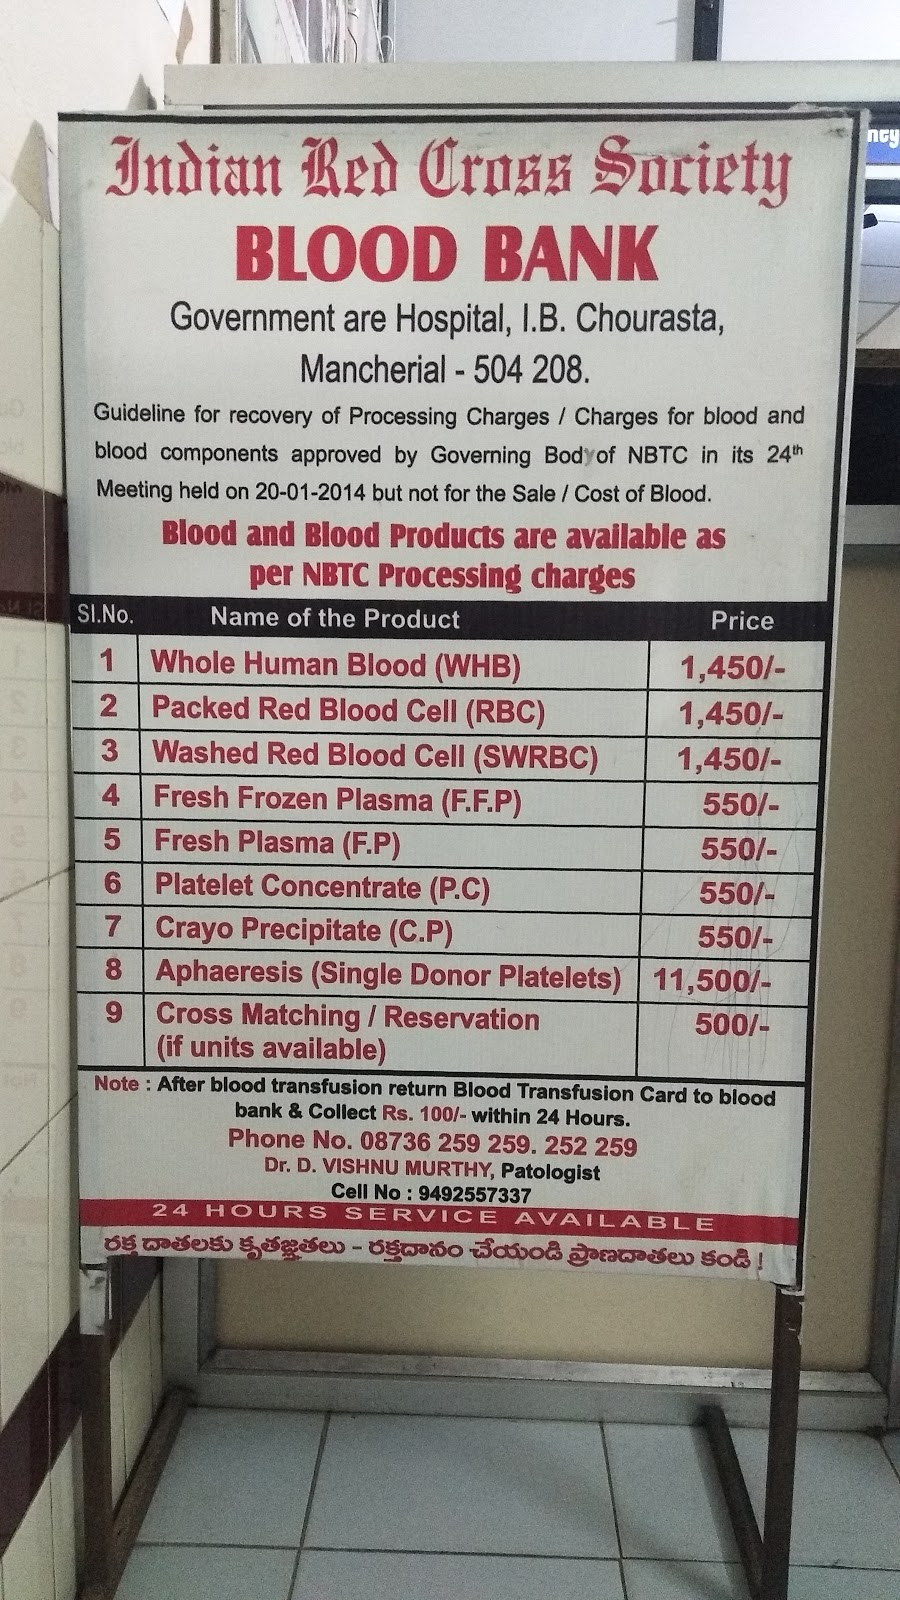 blood bank Indian Red Cross Society near Mancherial Telangana